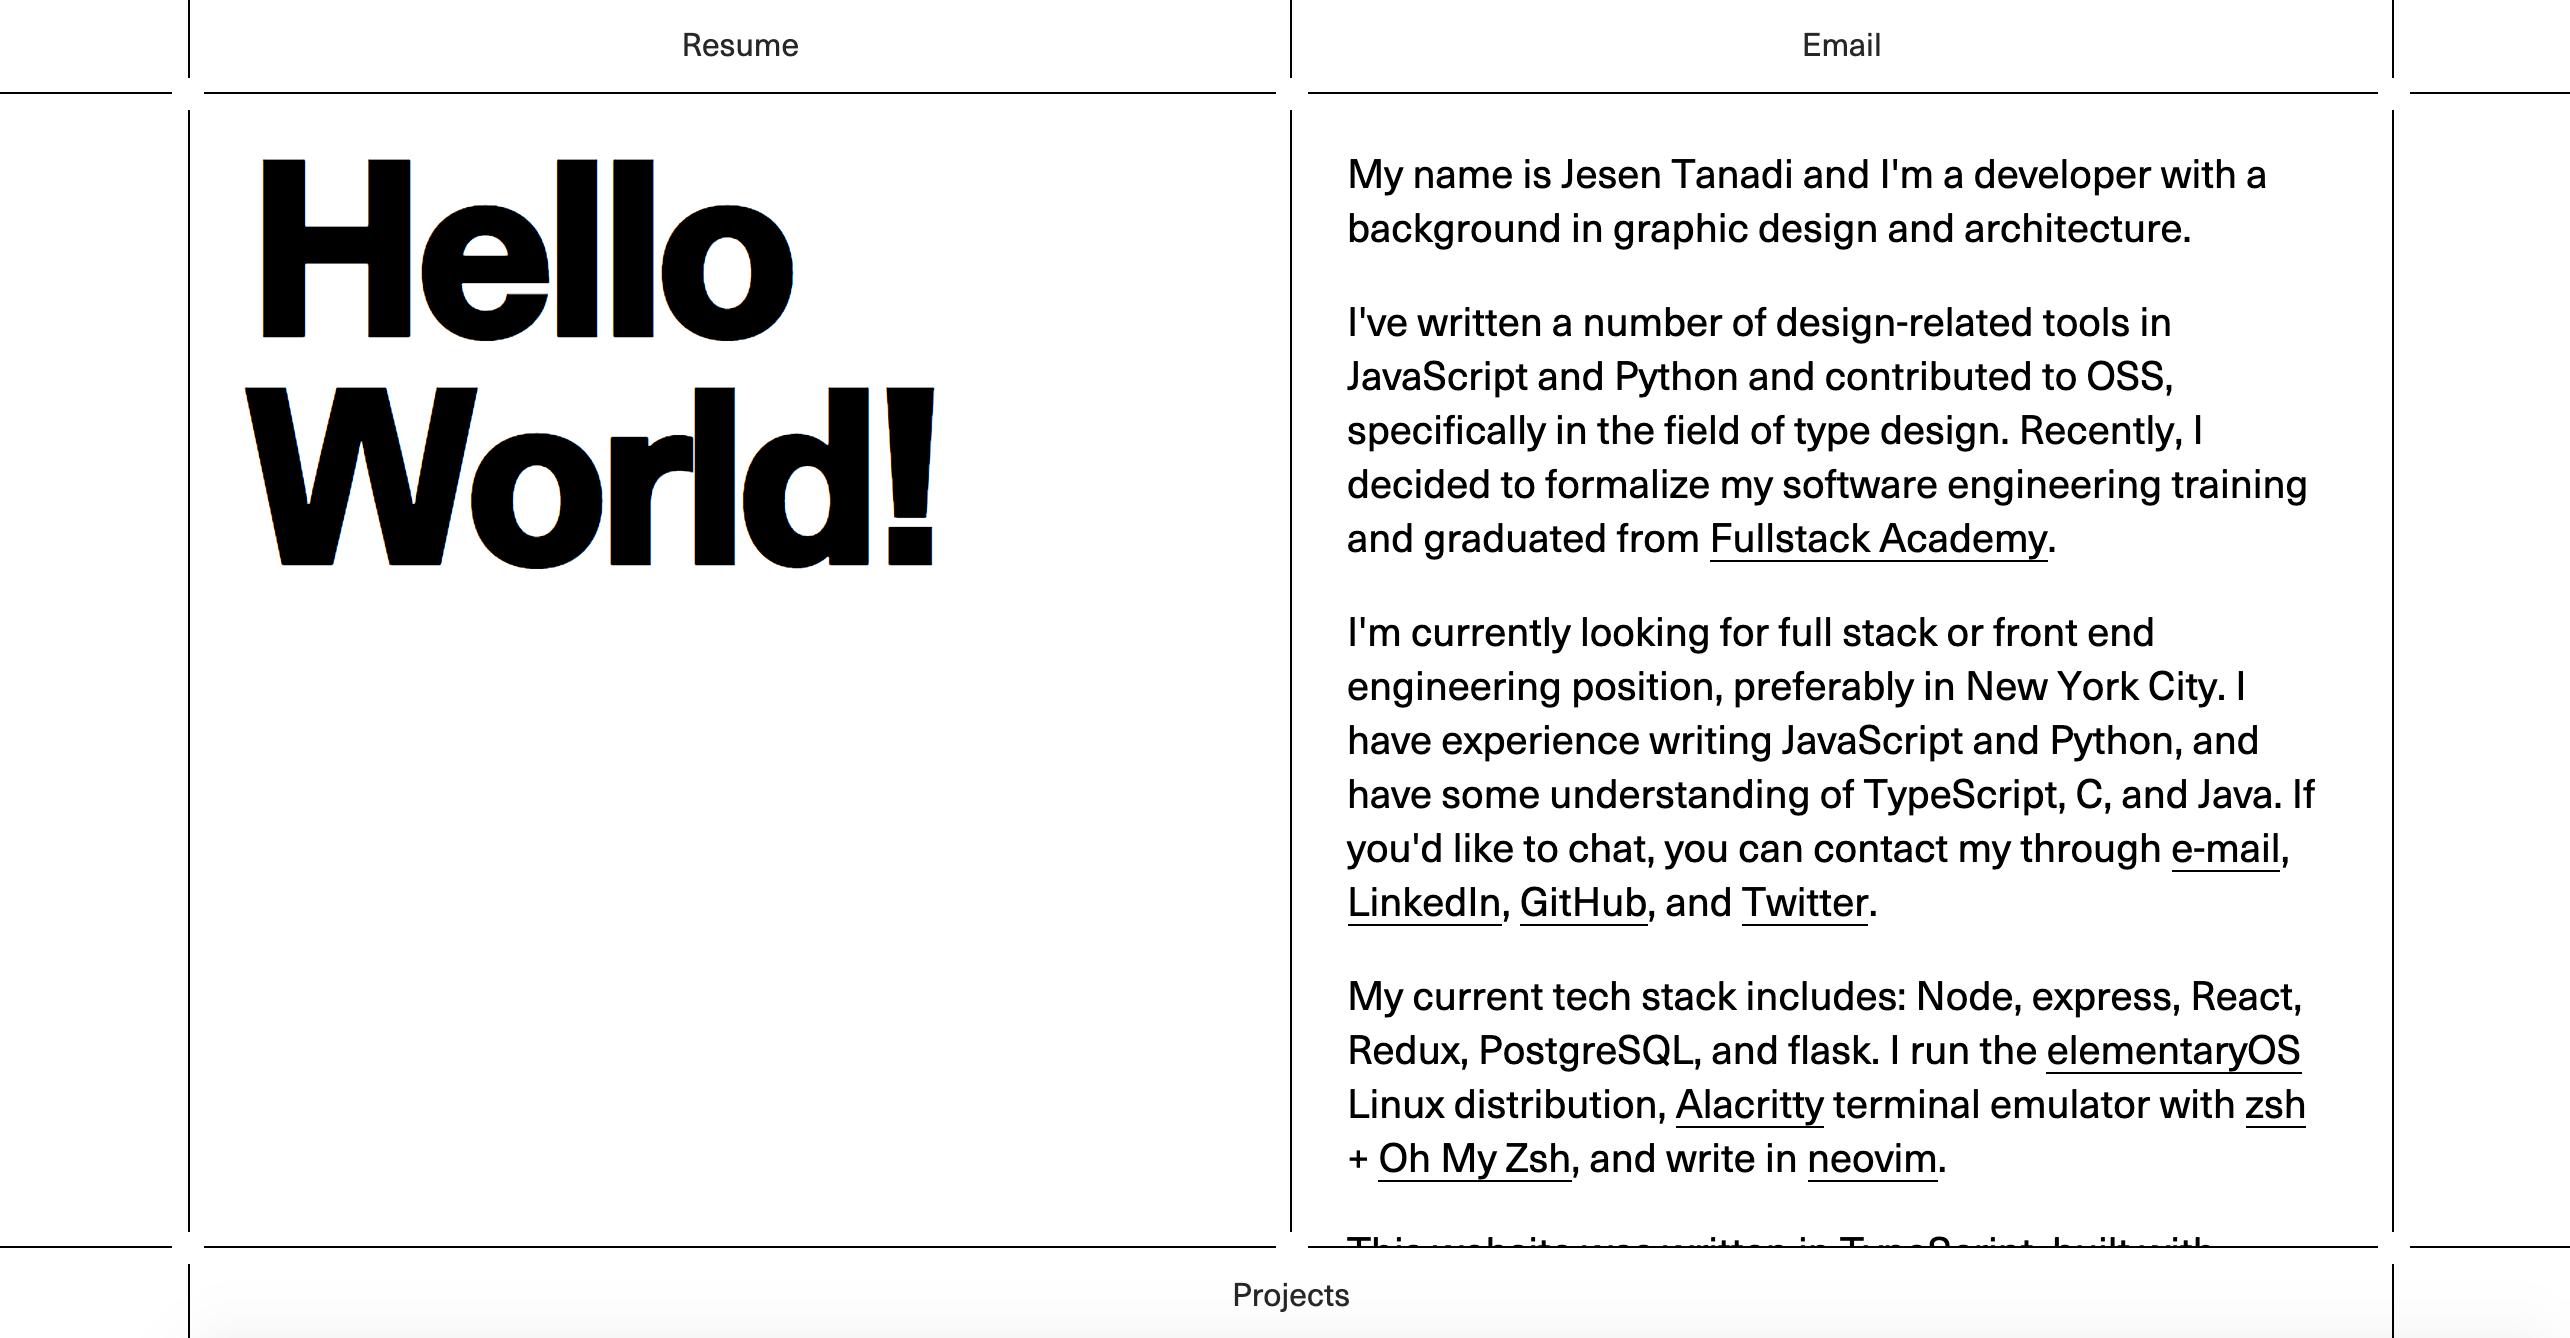 Jesen Tanadi portfolio website